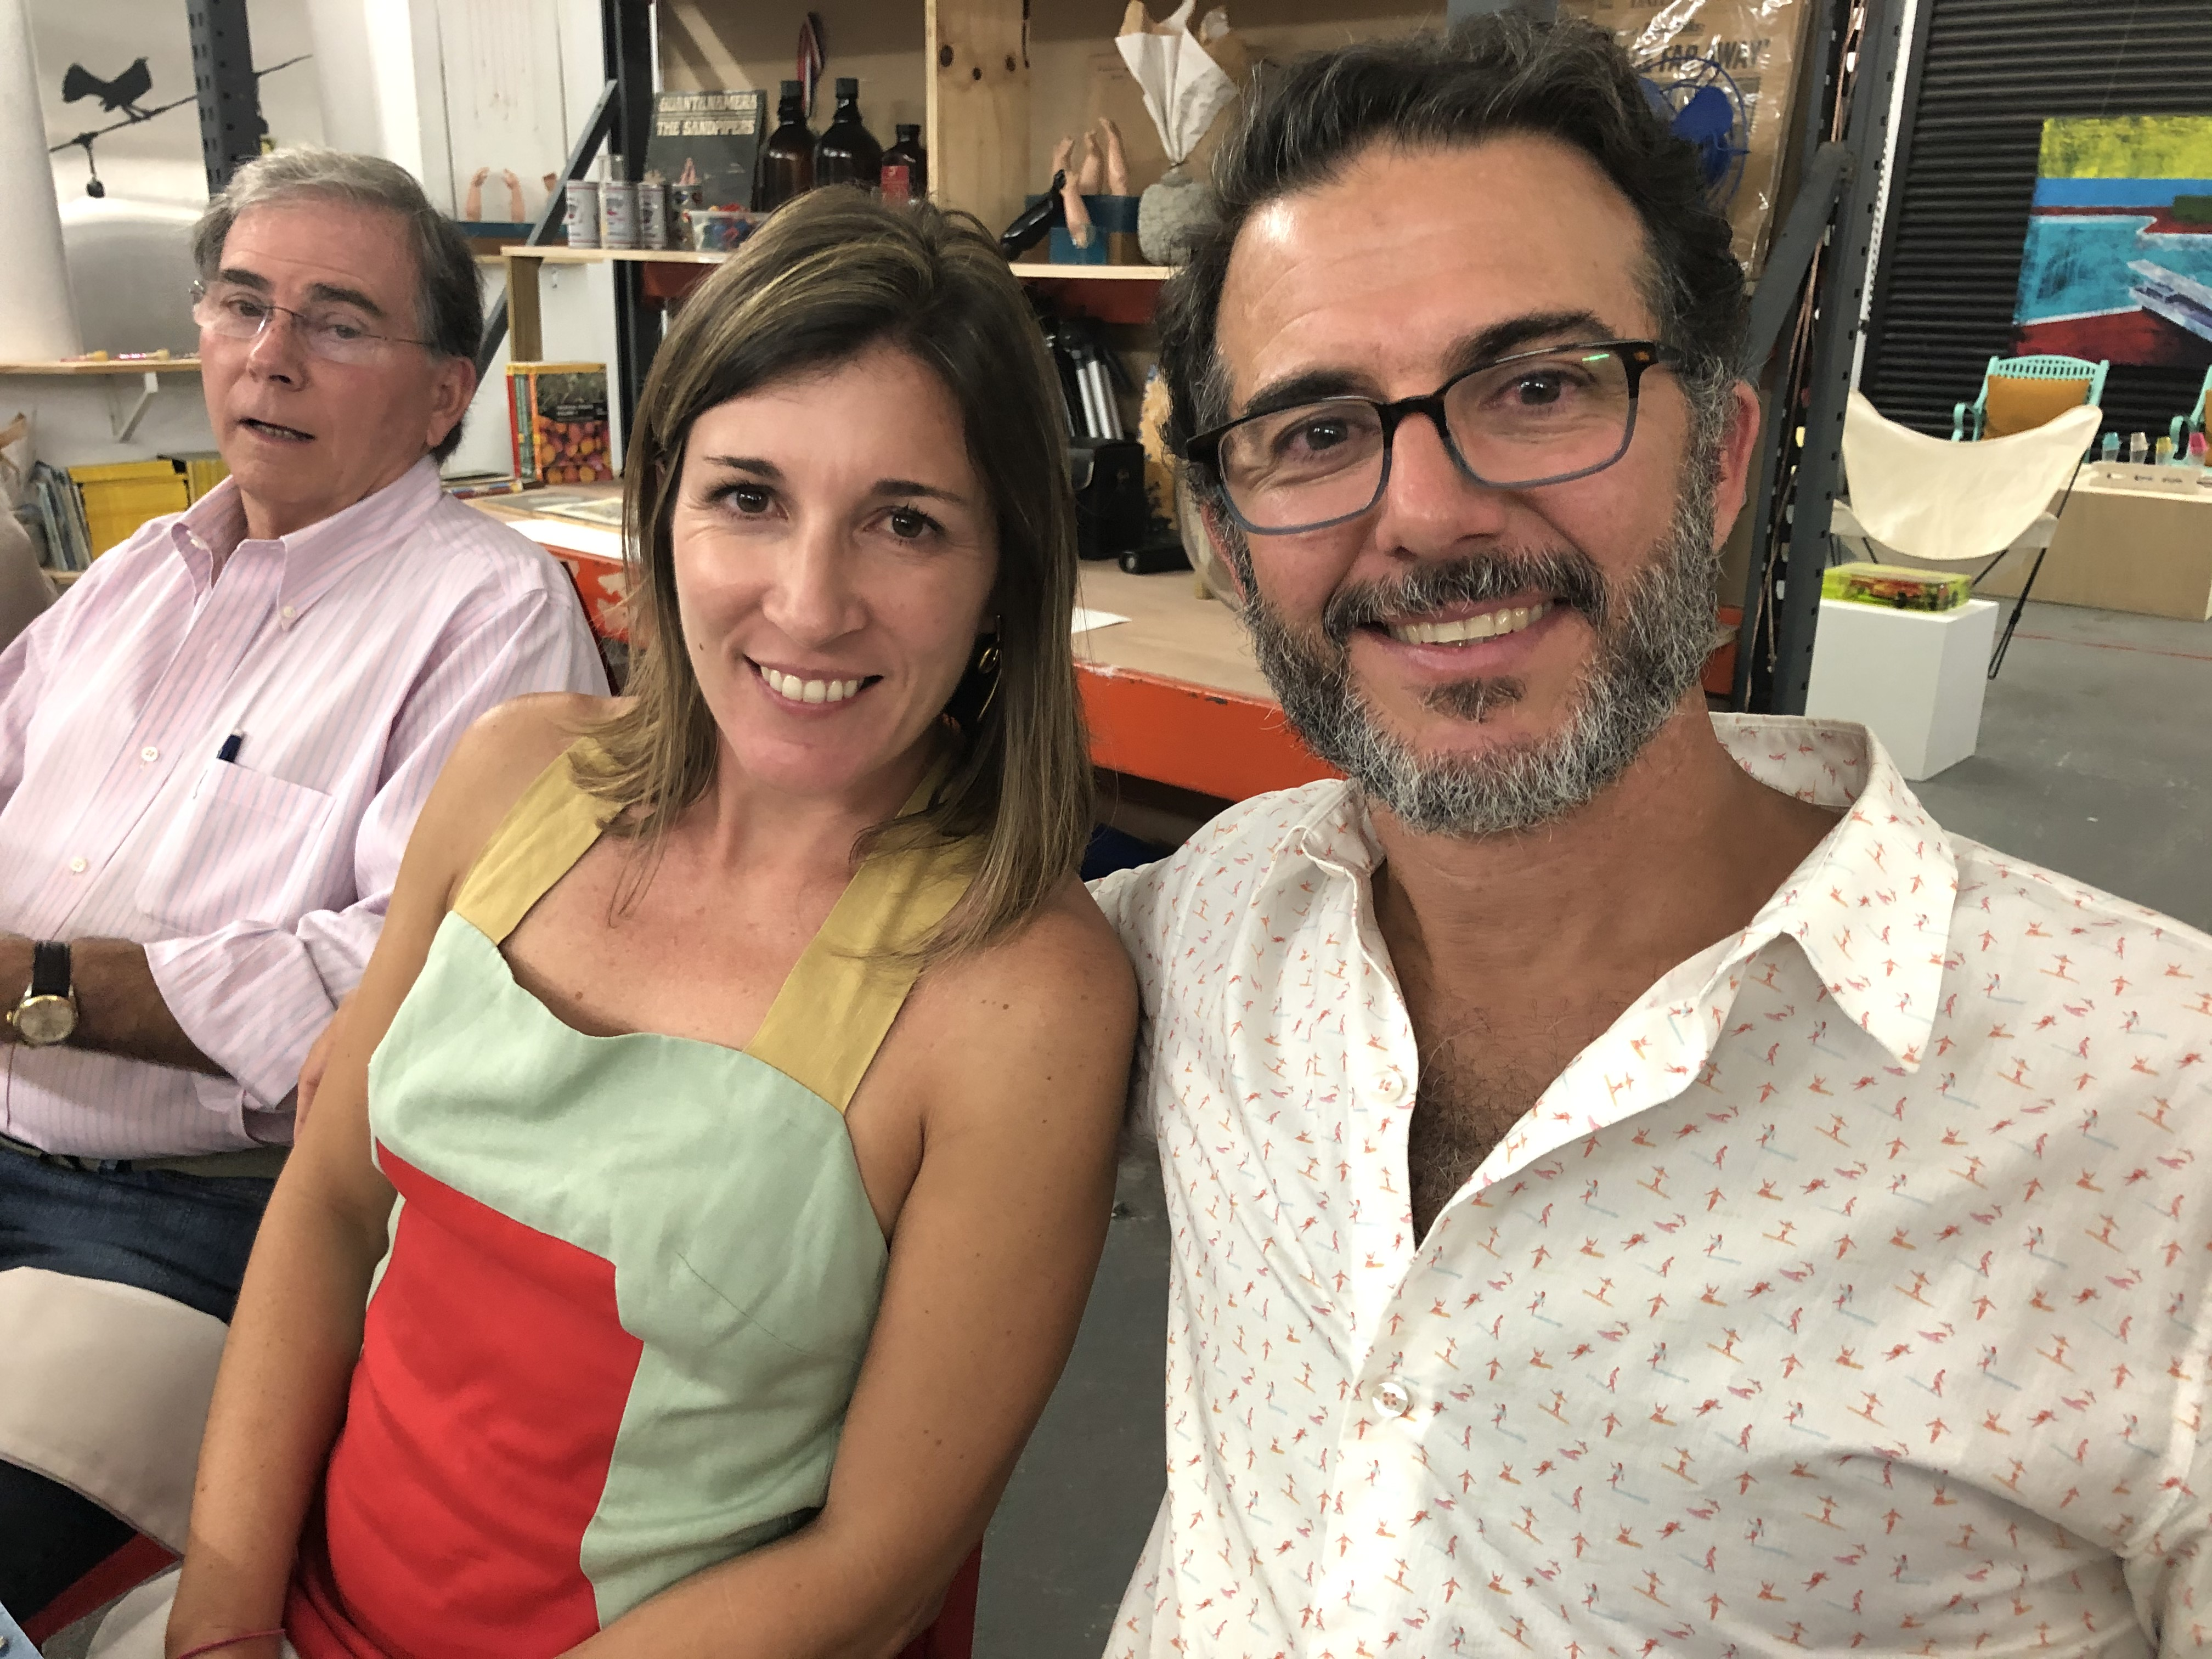 Silvia Bonachea y Eduardo Cabrer. Foto suministrada